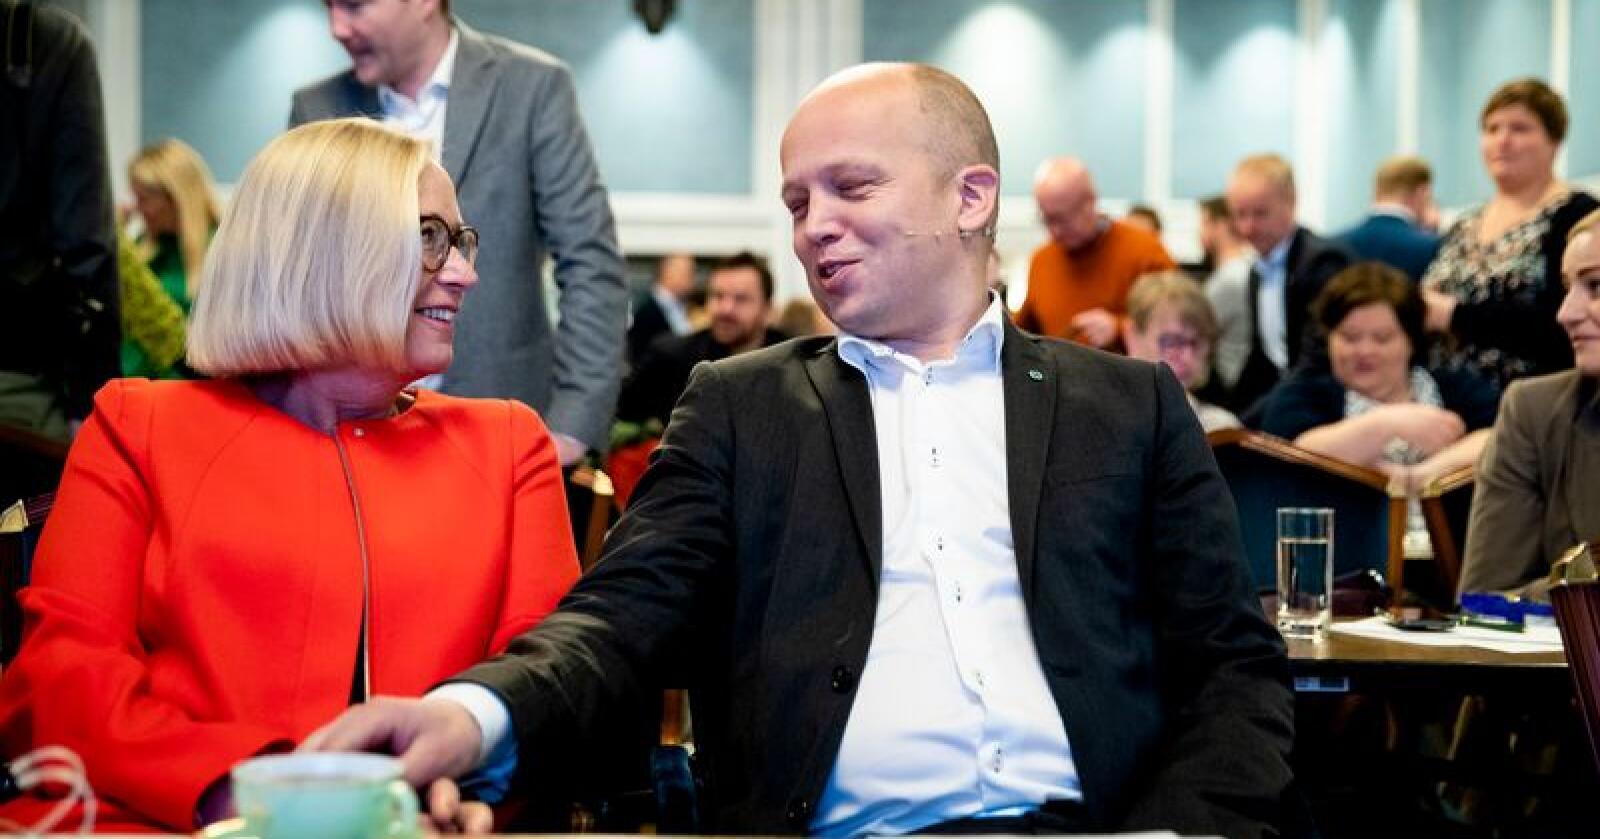 Parlamentarisk leder Marit Arnstad og partileder Trygve Slagsvold Vedum under Senterpartiets landsstyremøte på Hotell Bristol i Oslo. Nå leder de snart Norges største parti. Foto: Stian Lysberg Solum / NTB scanpix